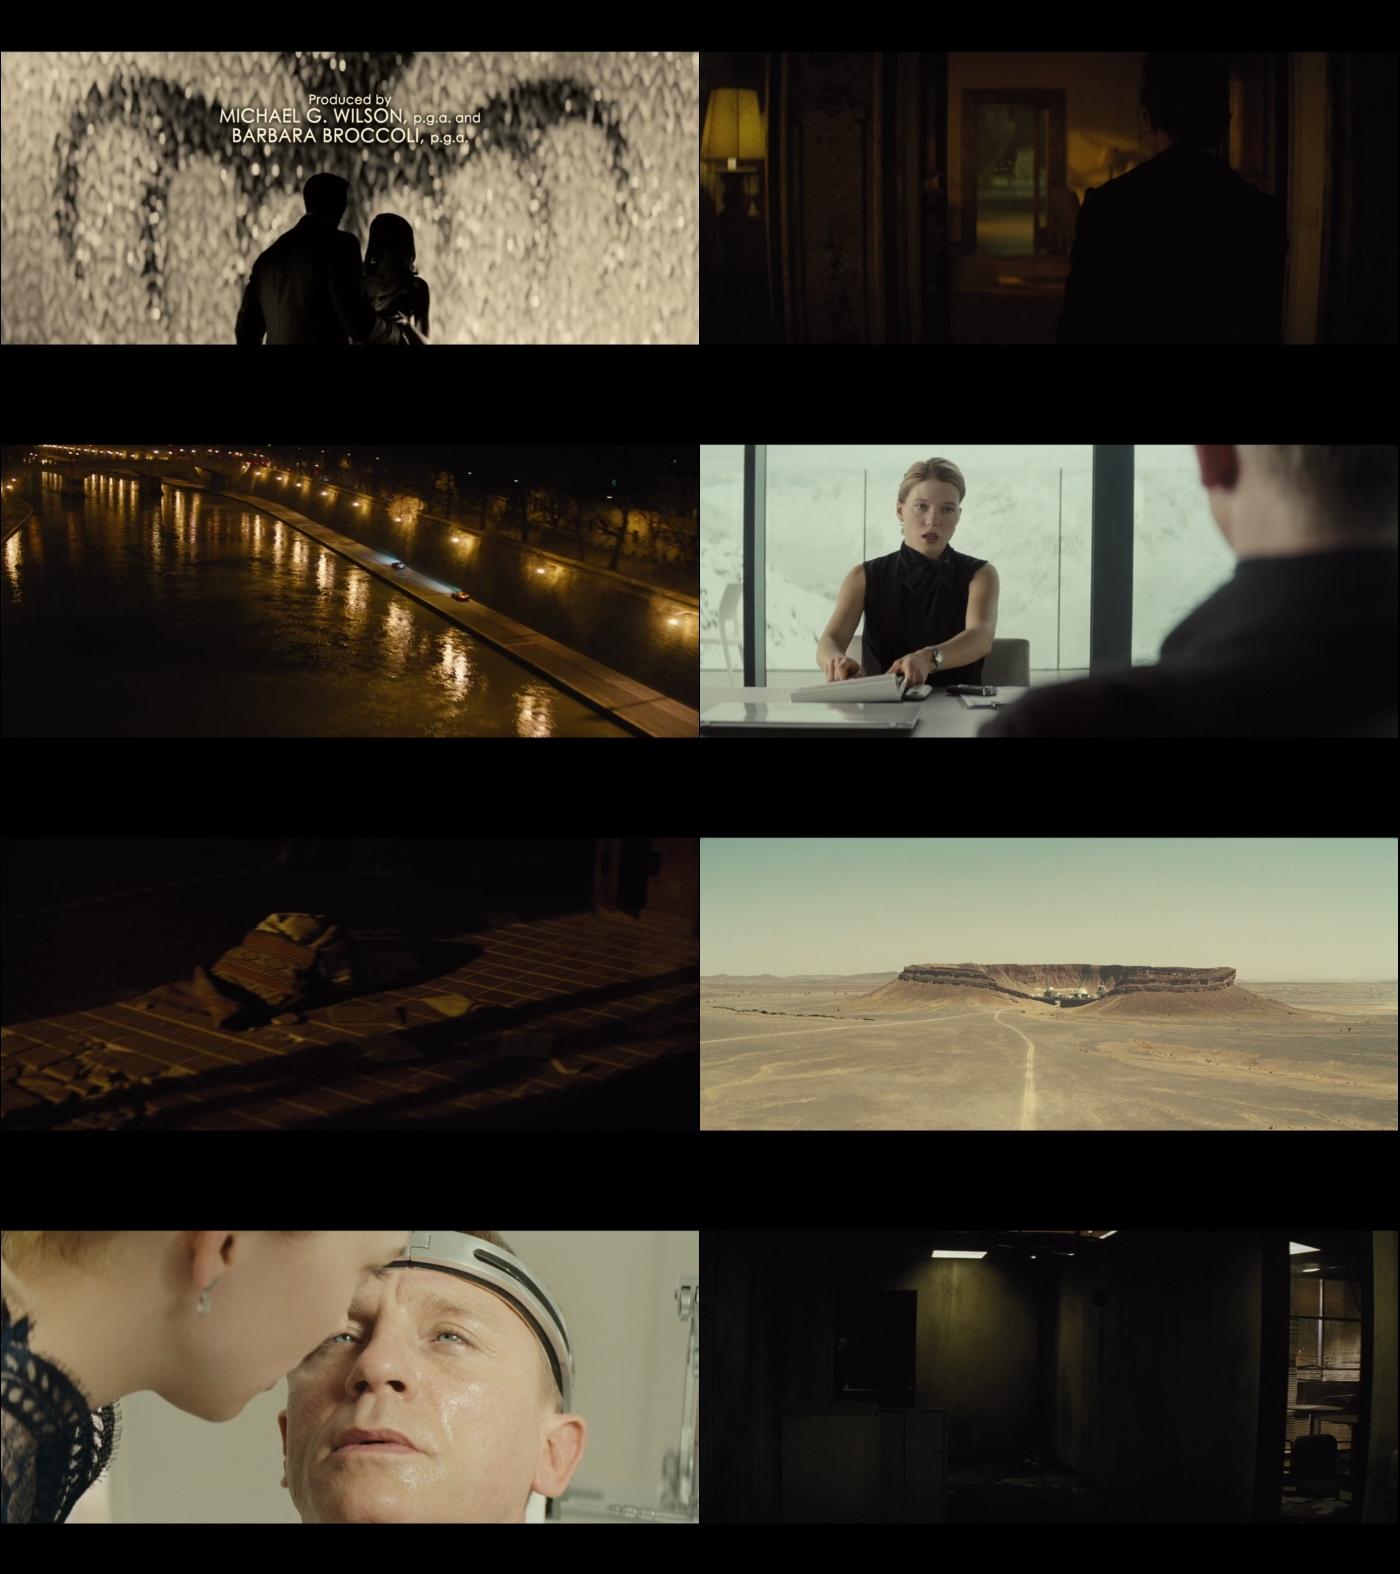 007 Spectre 1080p Latino